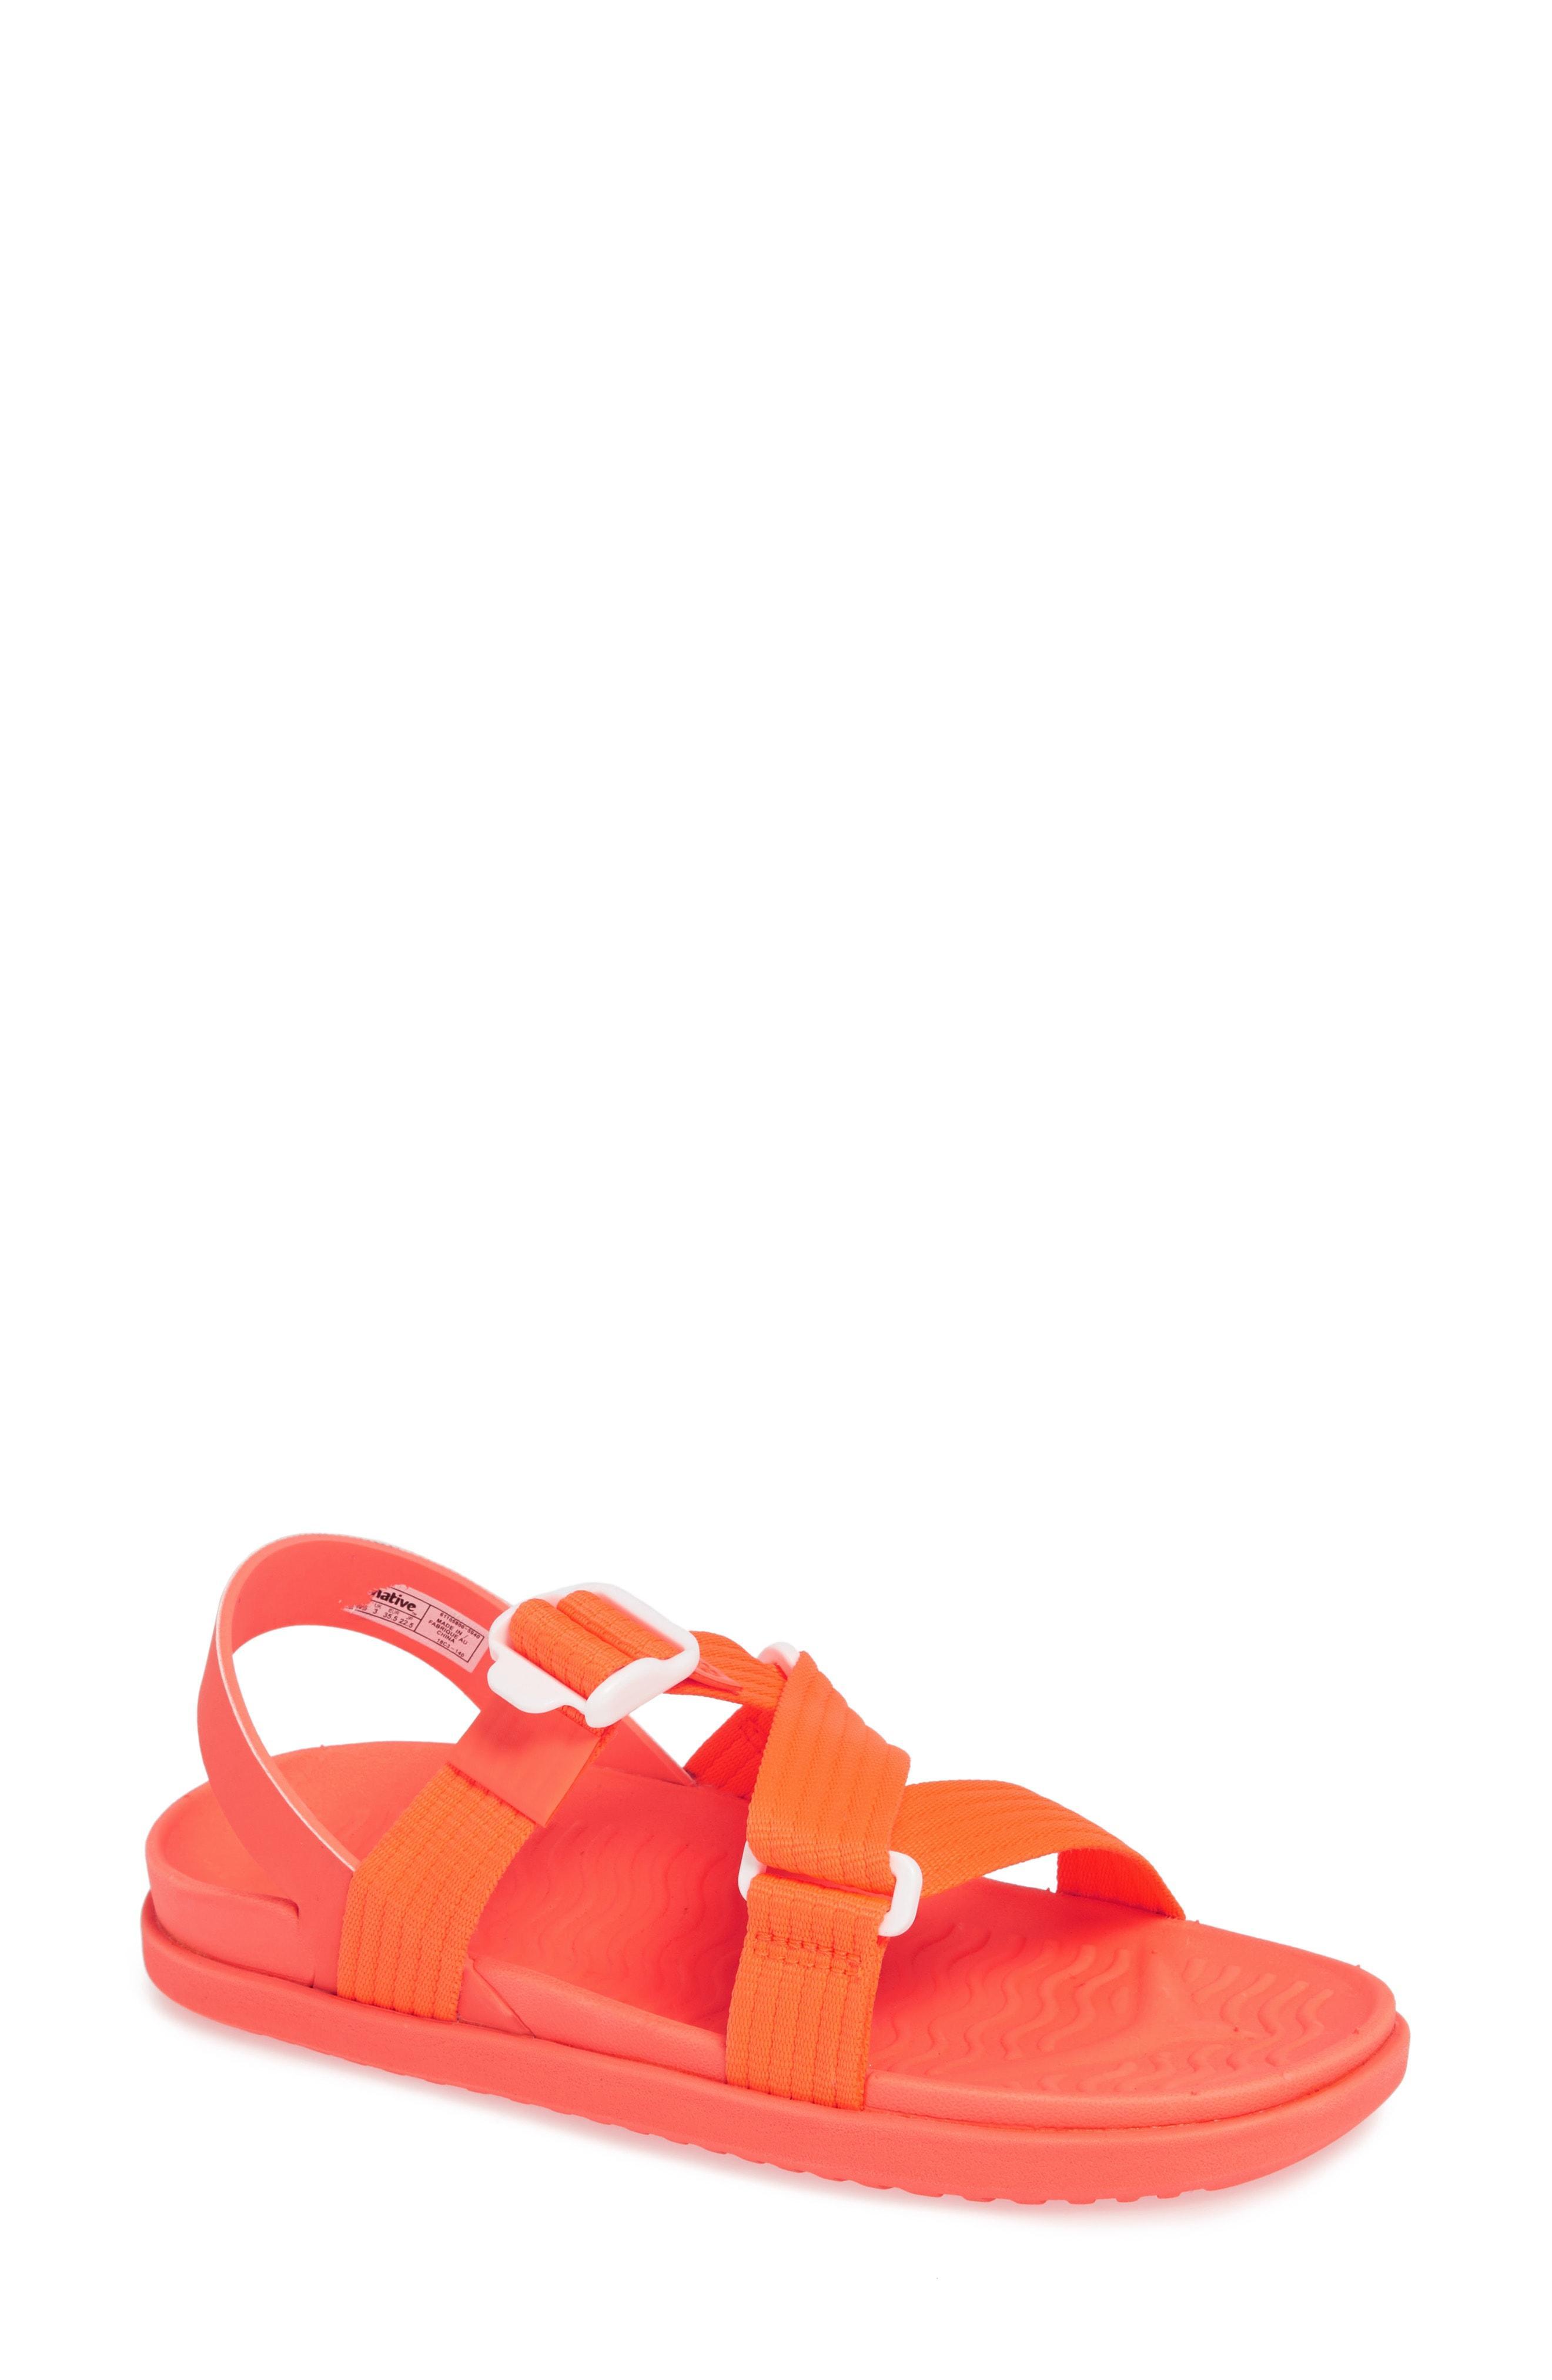 8867ee35375 Lyst - Native Shoes Zurich Vegan Sandal in Pink